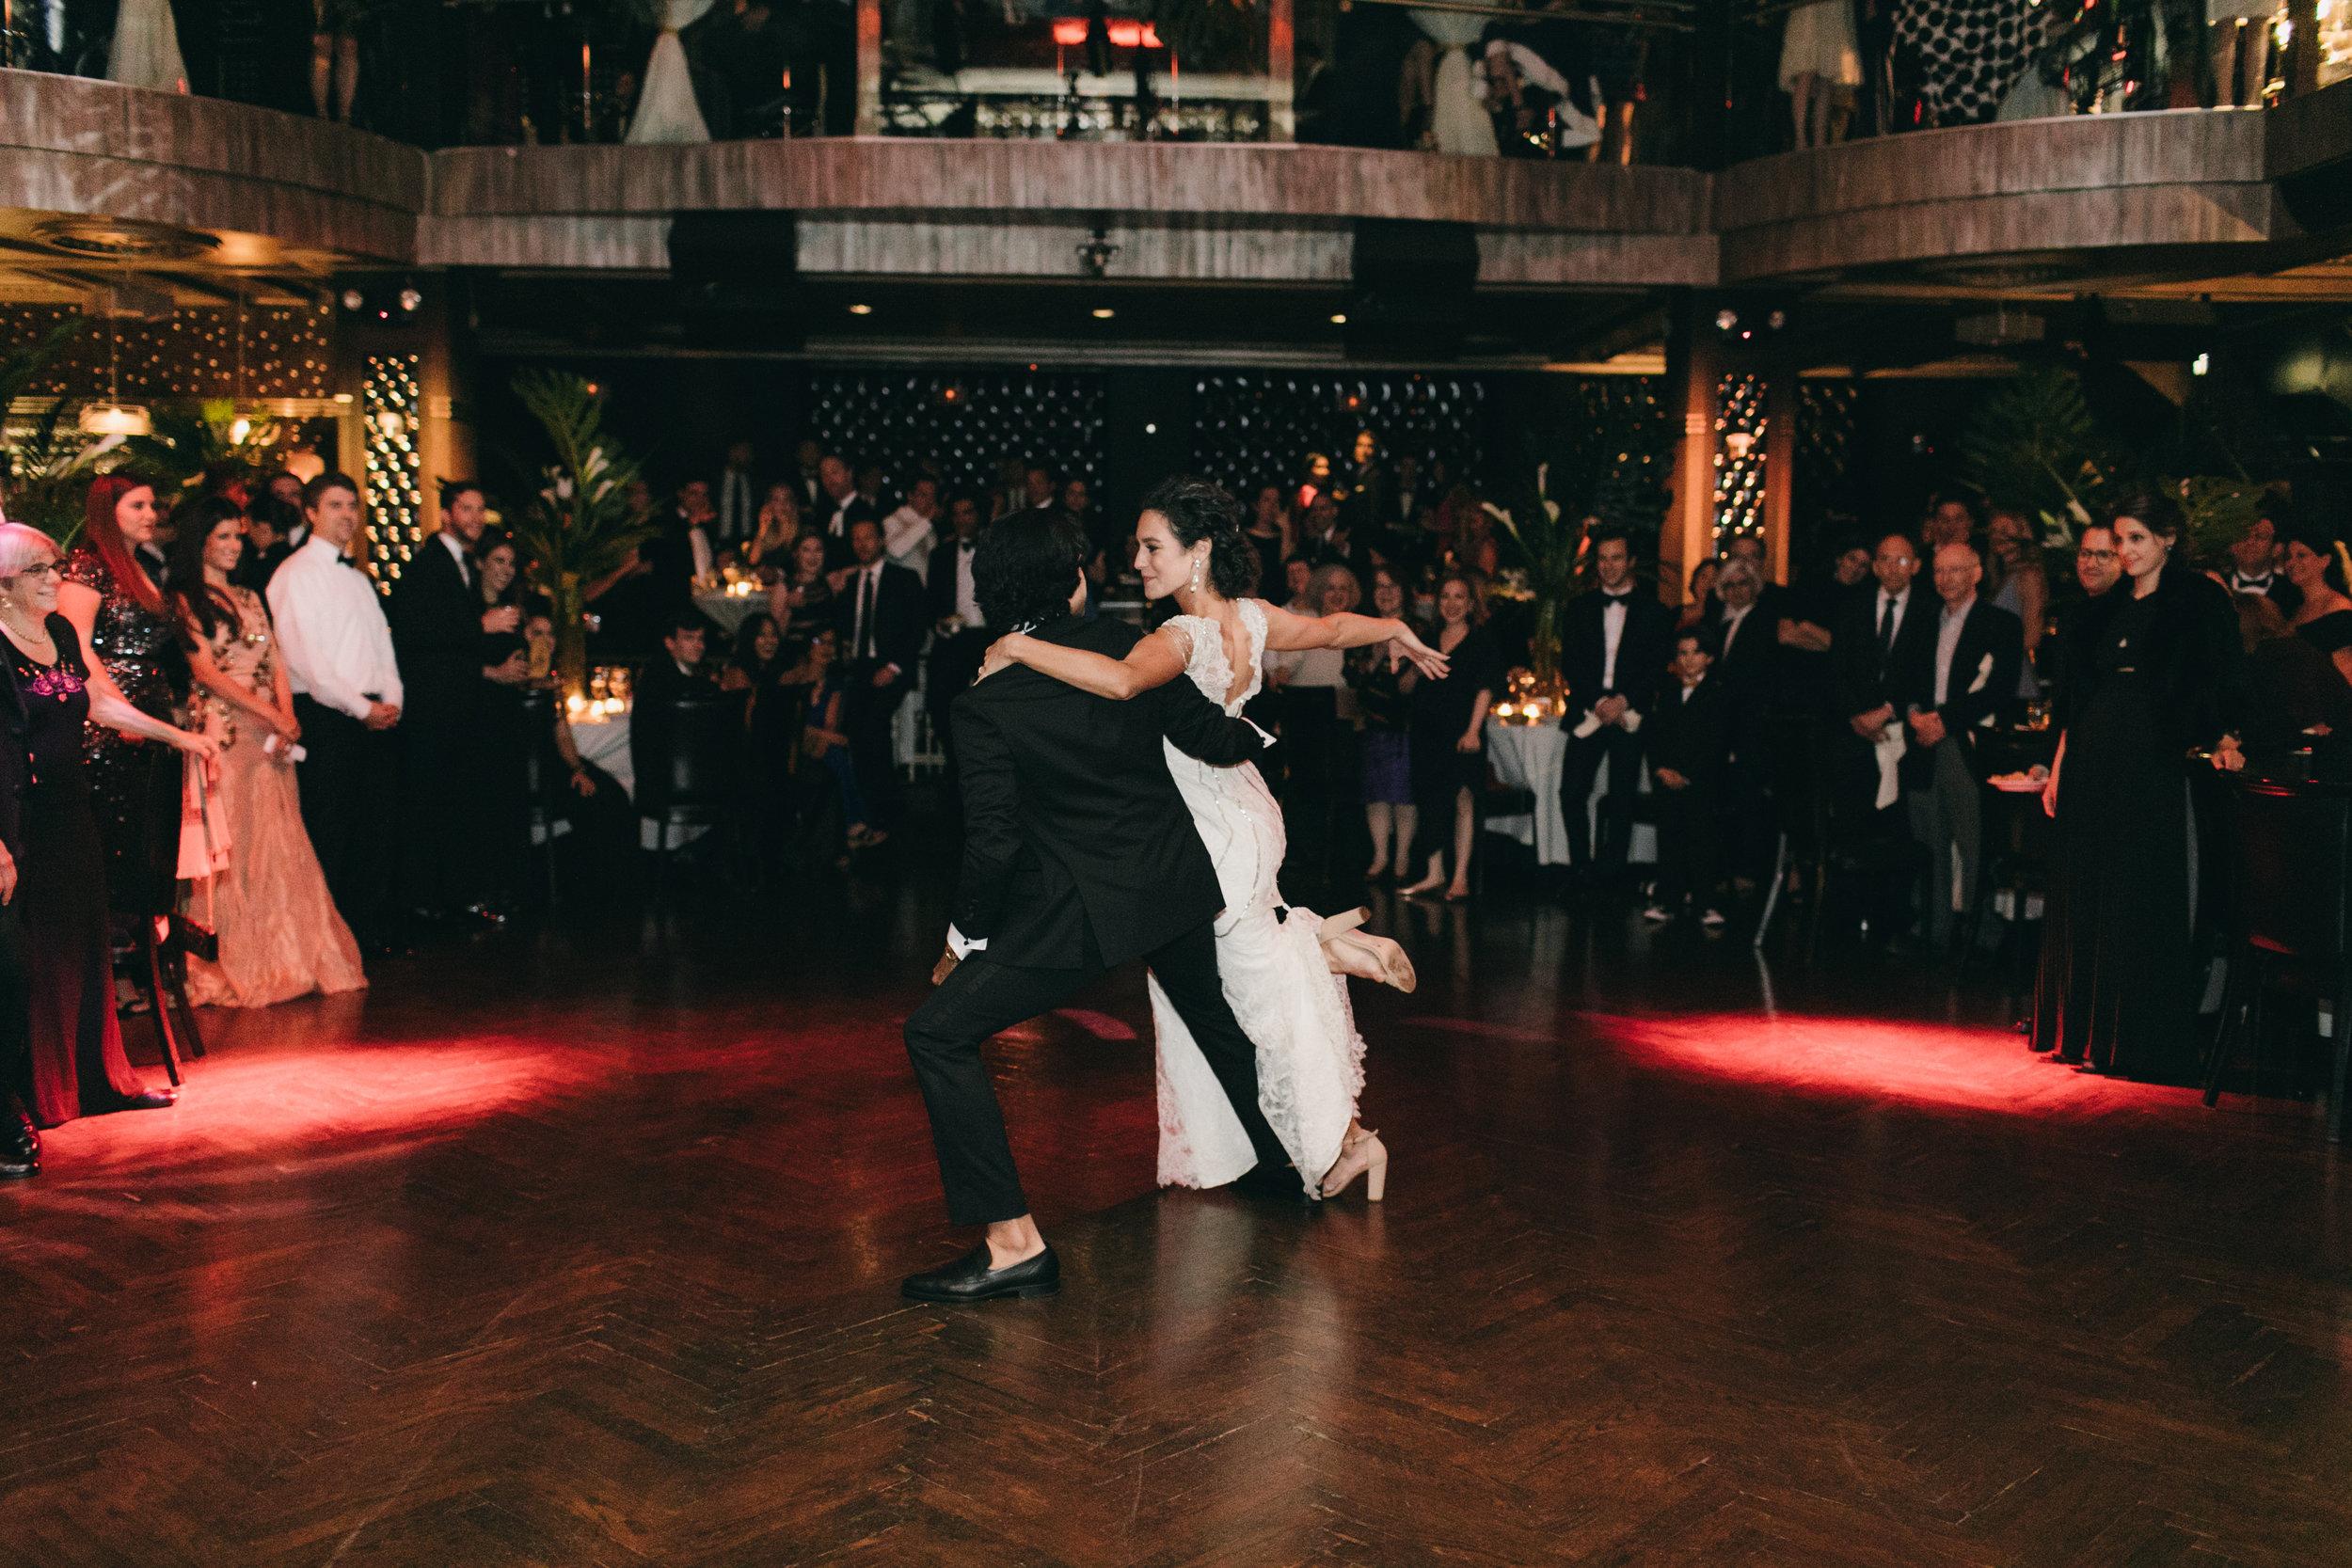 Quyn-Duong-New-York-City-Wedding0079.JPG